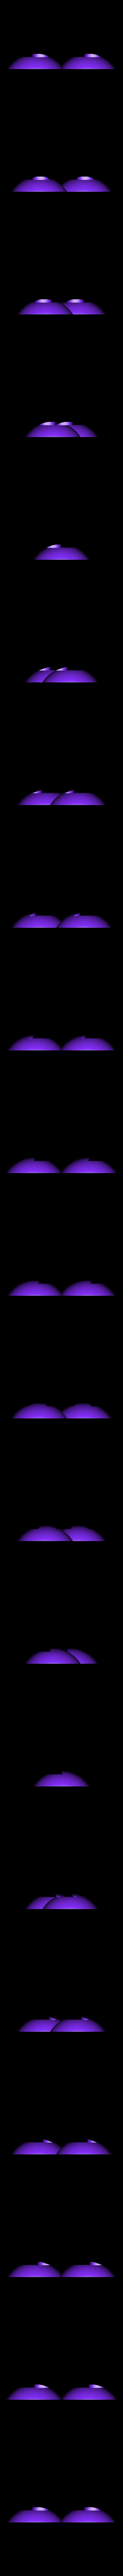 Owl_eyes.STL Download free STL file Multi-Color Owl Bookmark • 3D printer template, MosaicManufacturing